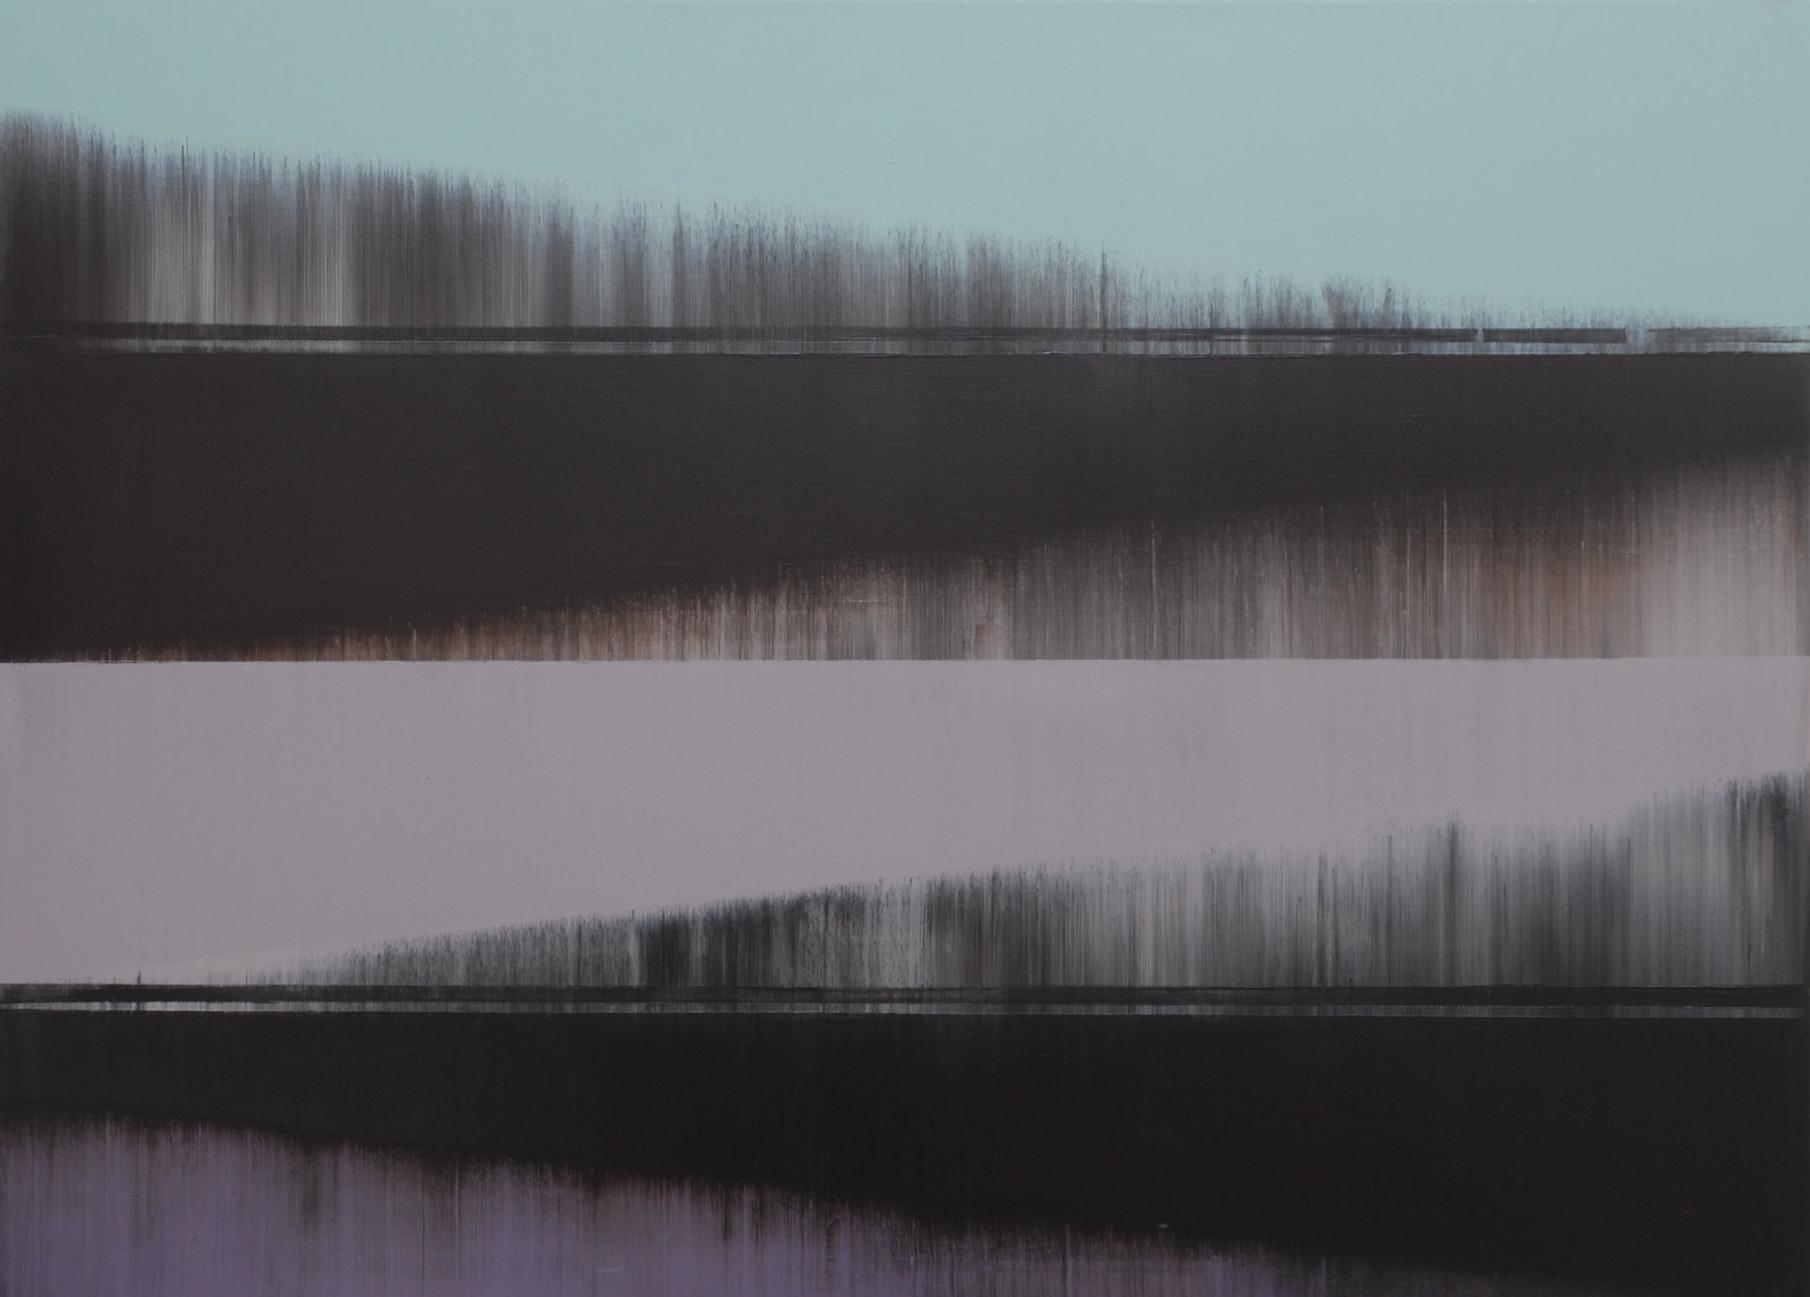 Parallel Terrain vi  |  80cm x 60cm Oil on Canvas